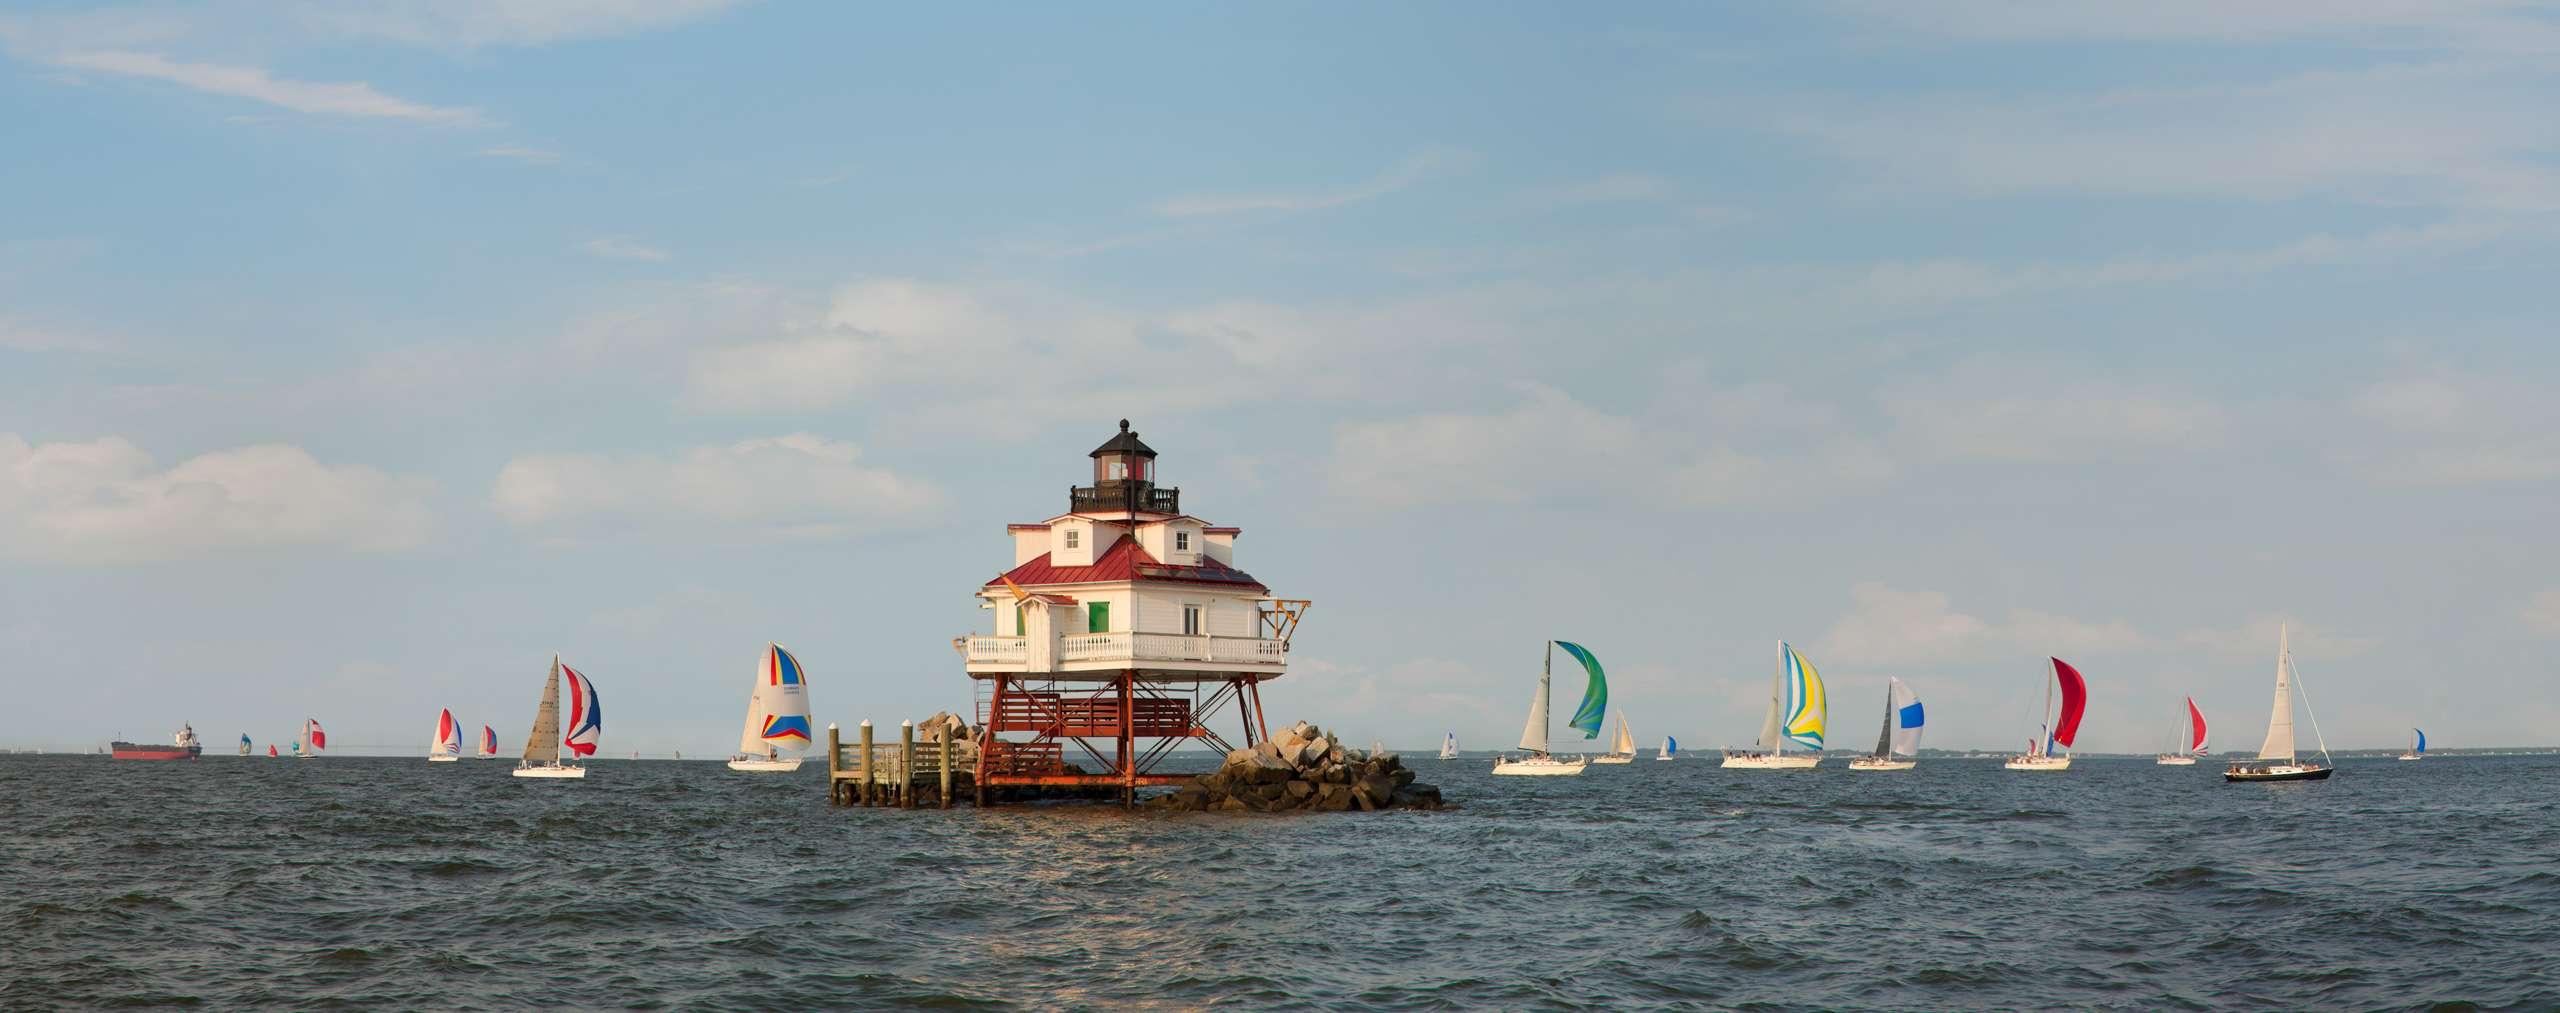 PORTFOLIO - Sailing - Chesapeake #28-PCG-536